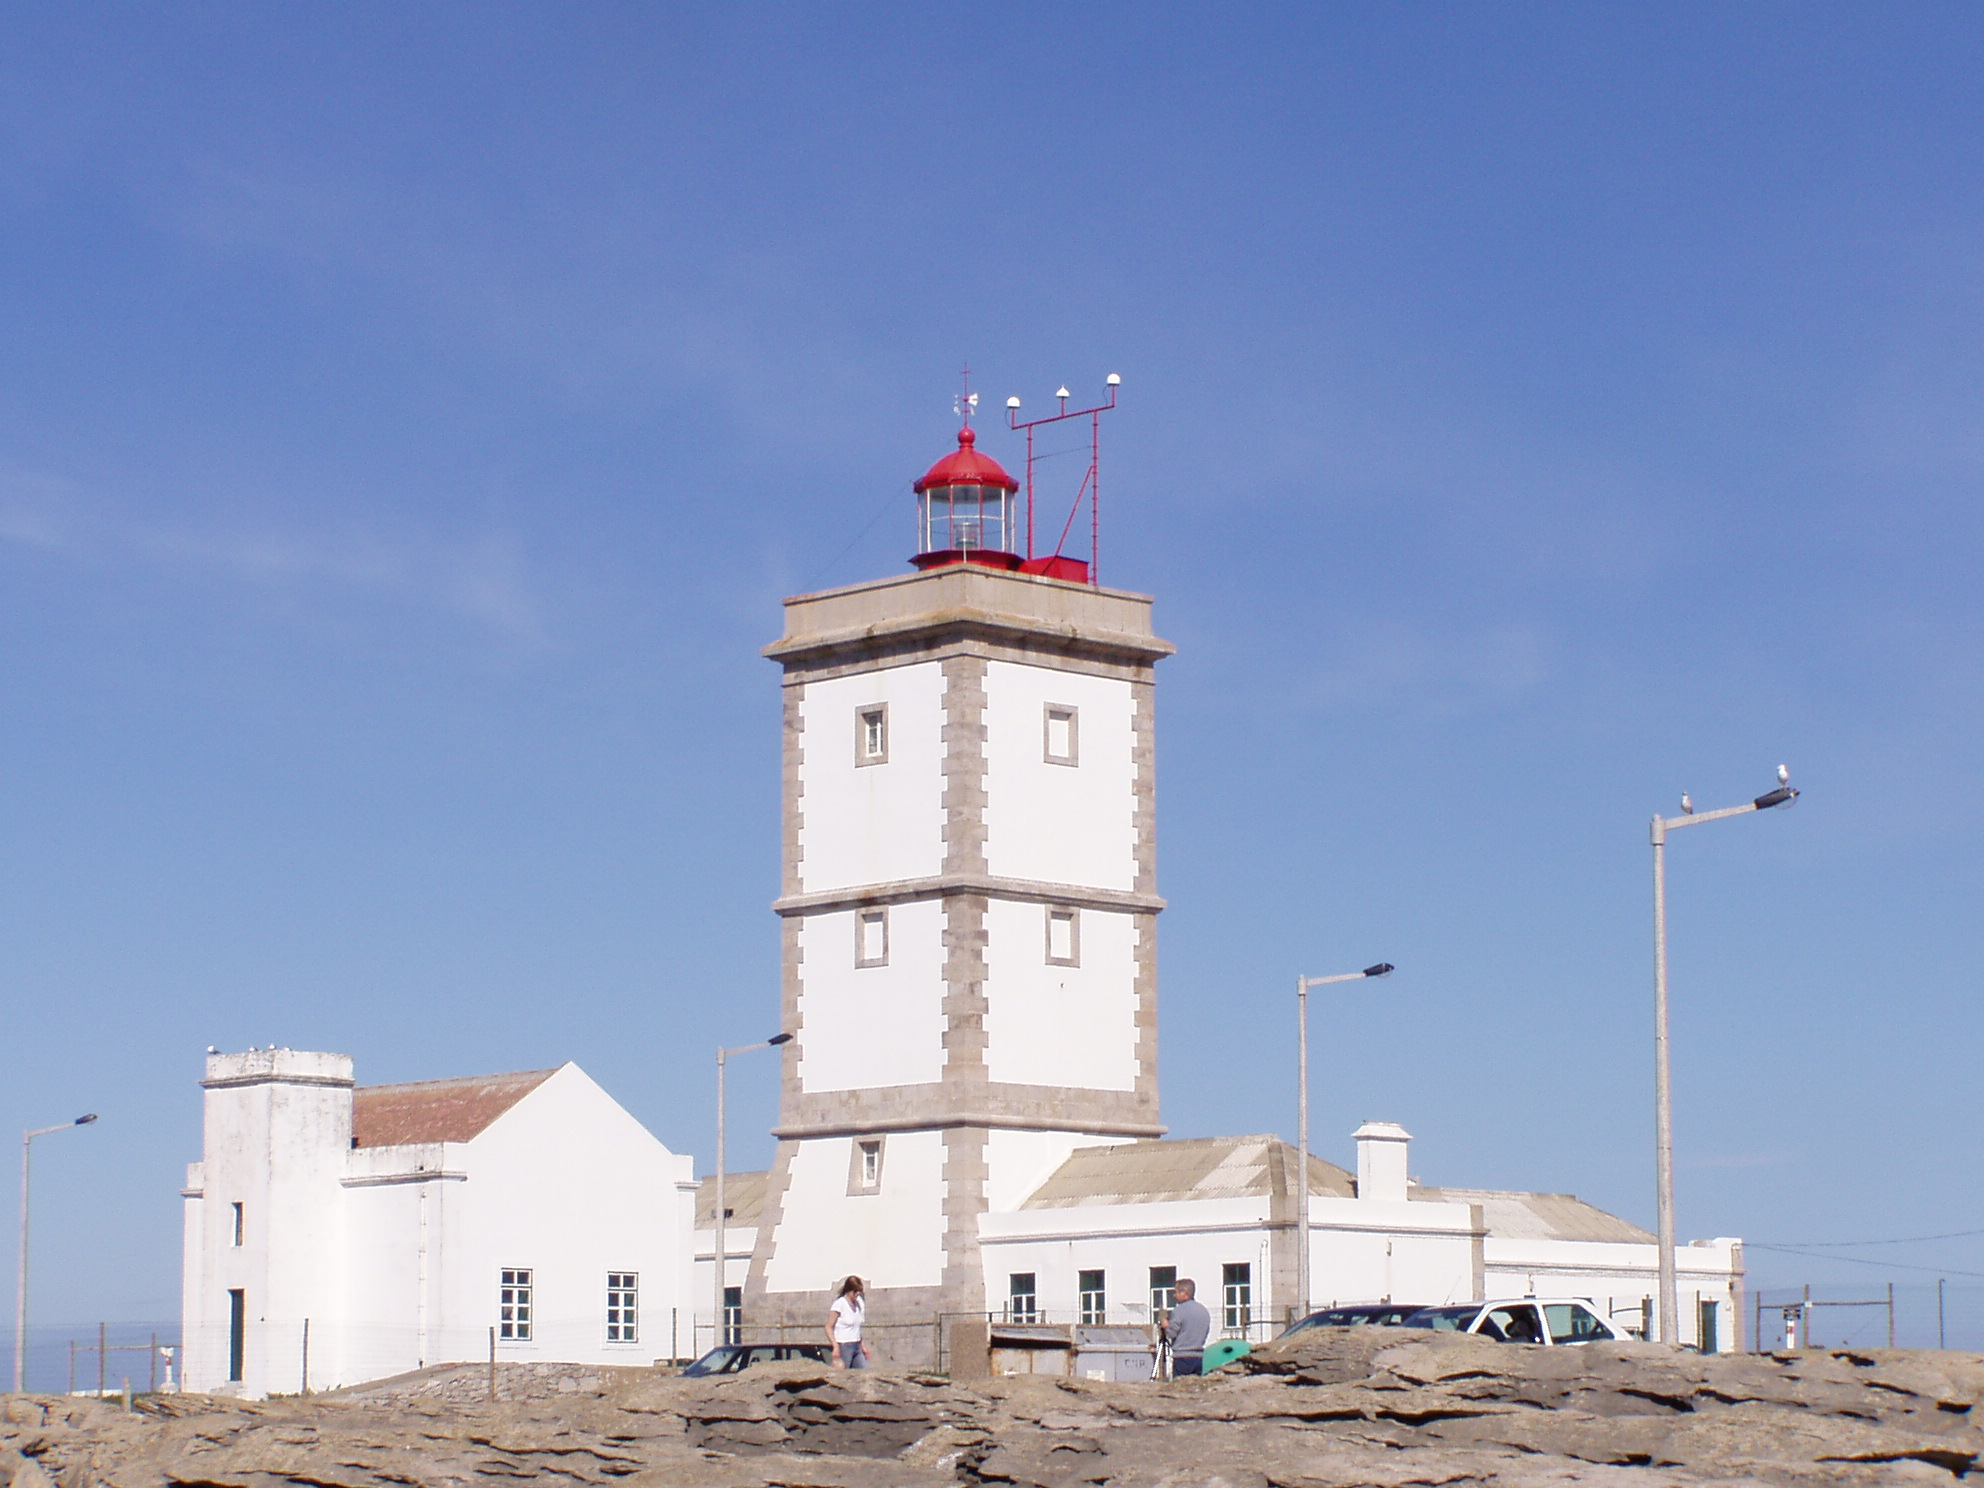 https://upload.wikimedia.org/wikipedia/commons/4/47/Cabo_Carvoeiro_farol.jpg